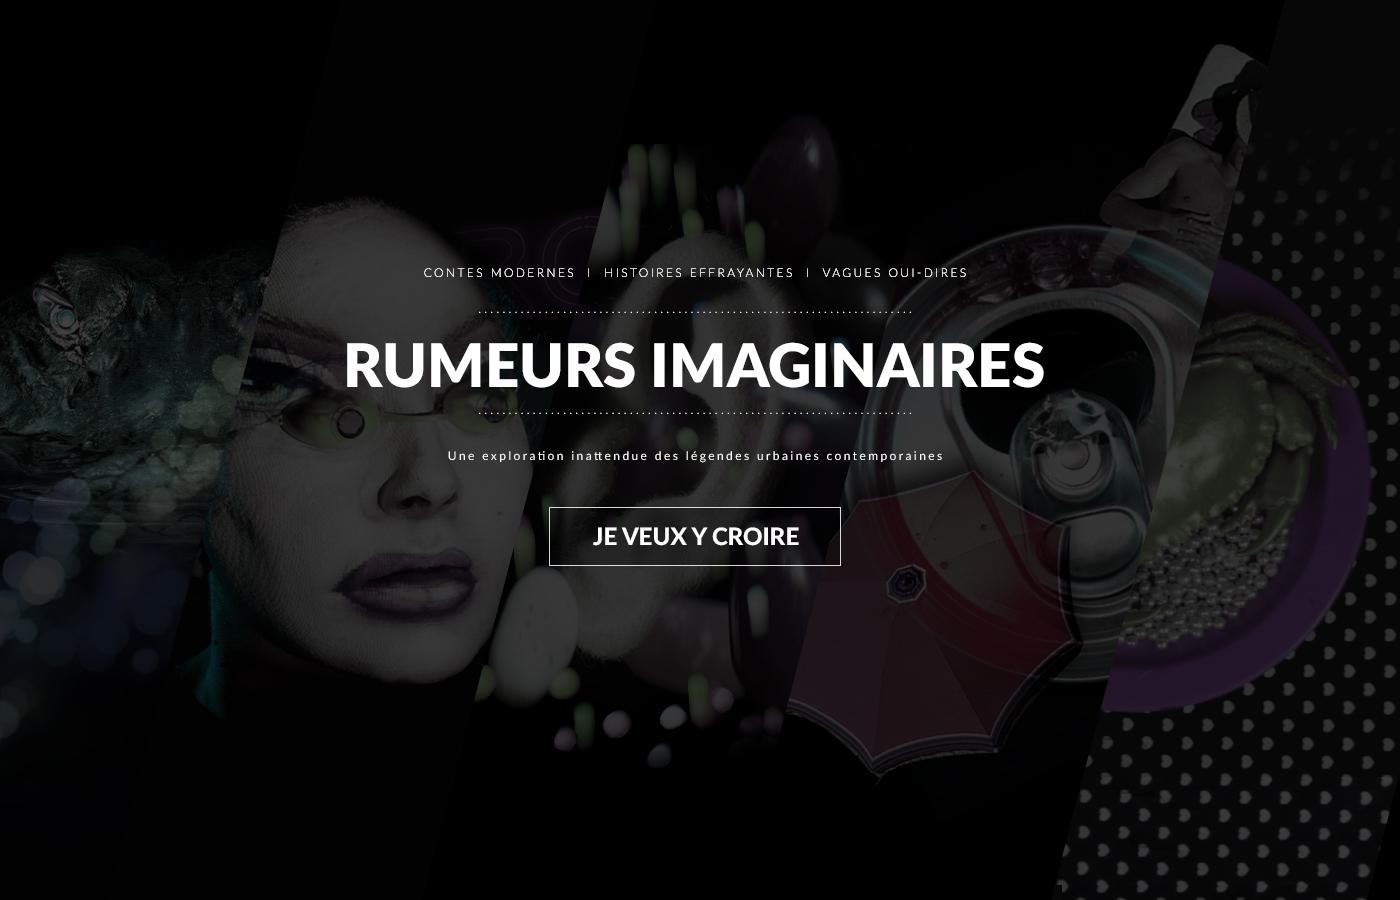 Rumeurs imaginaires